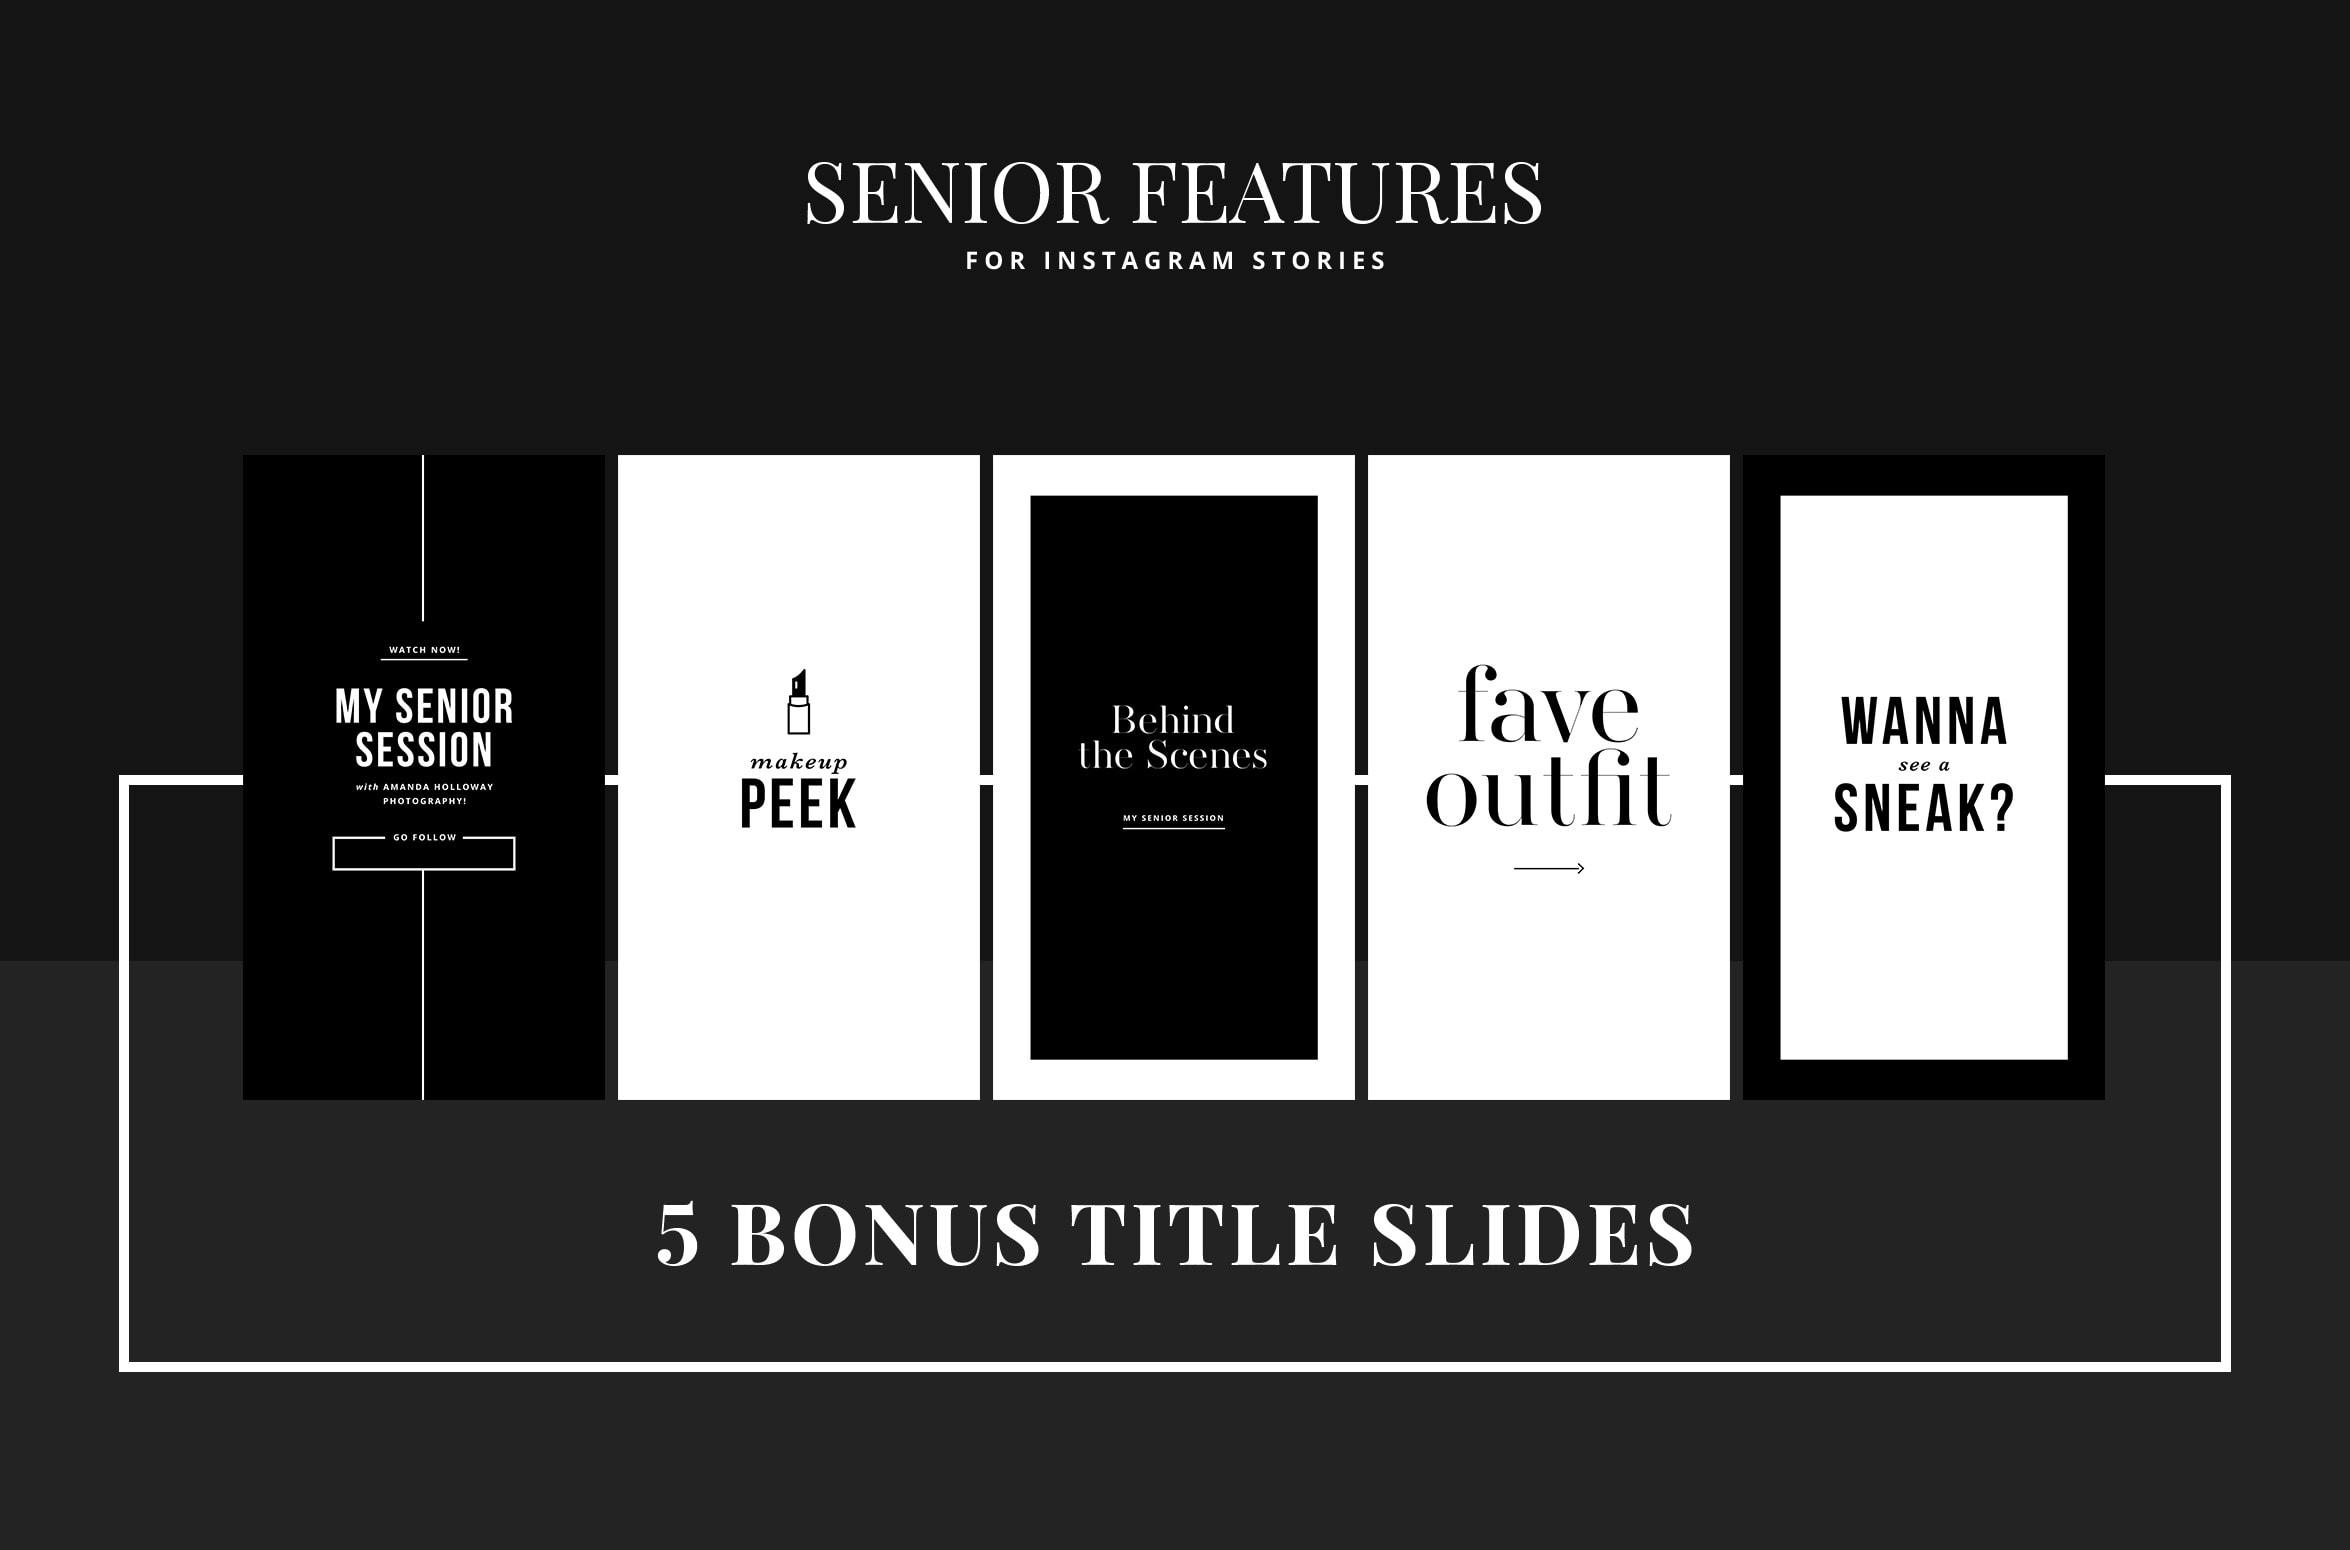 Senior IG Features: Sophistication